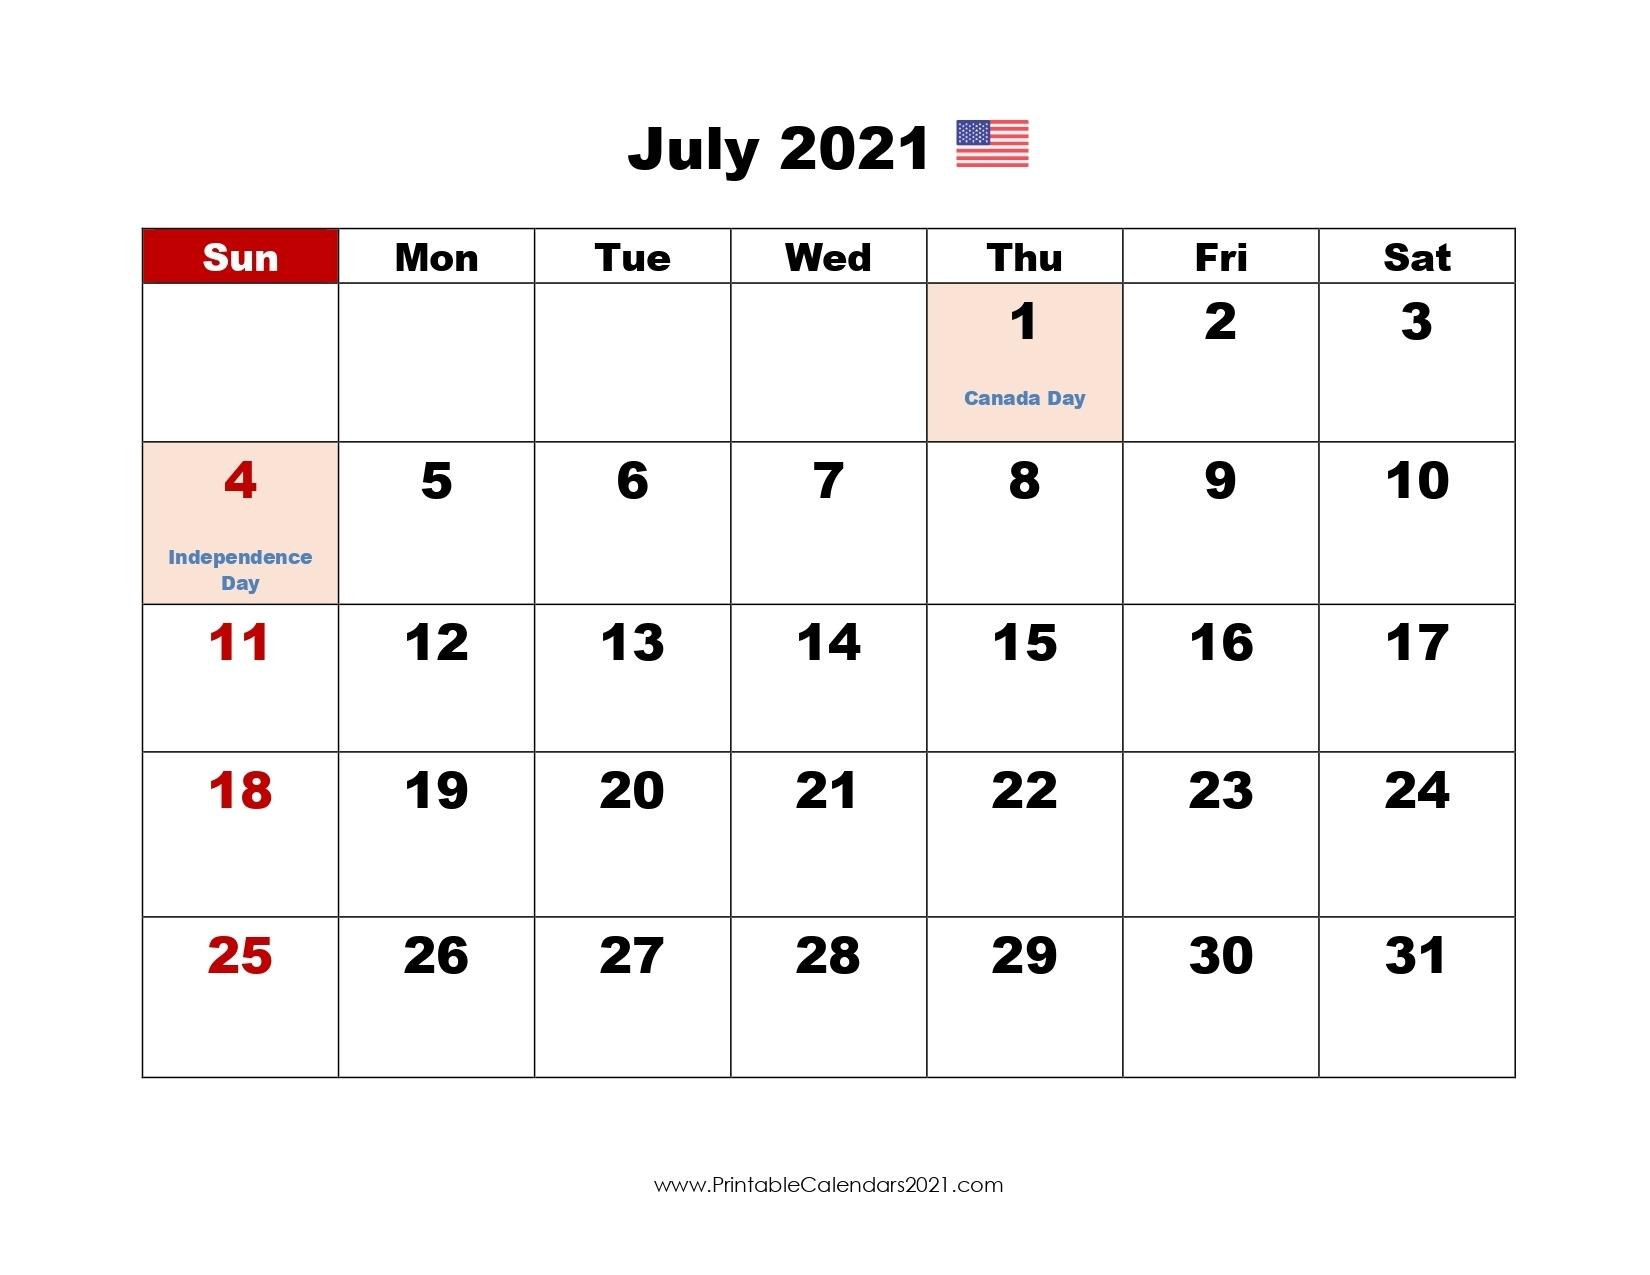 Printable Calendar July 2021, Printable 2021 Calendar With Holidays Printable July And August 2021 Calendar